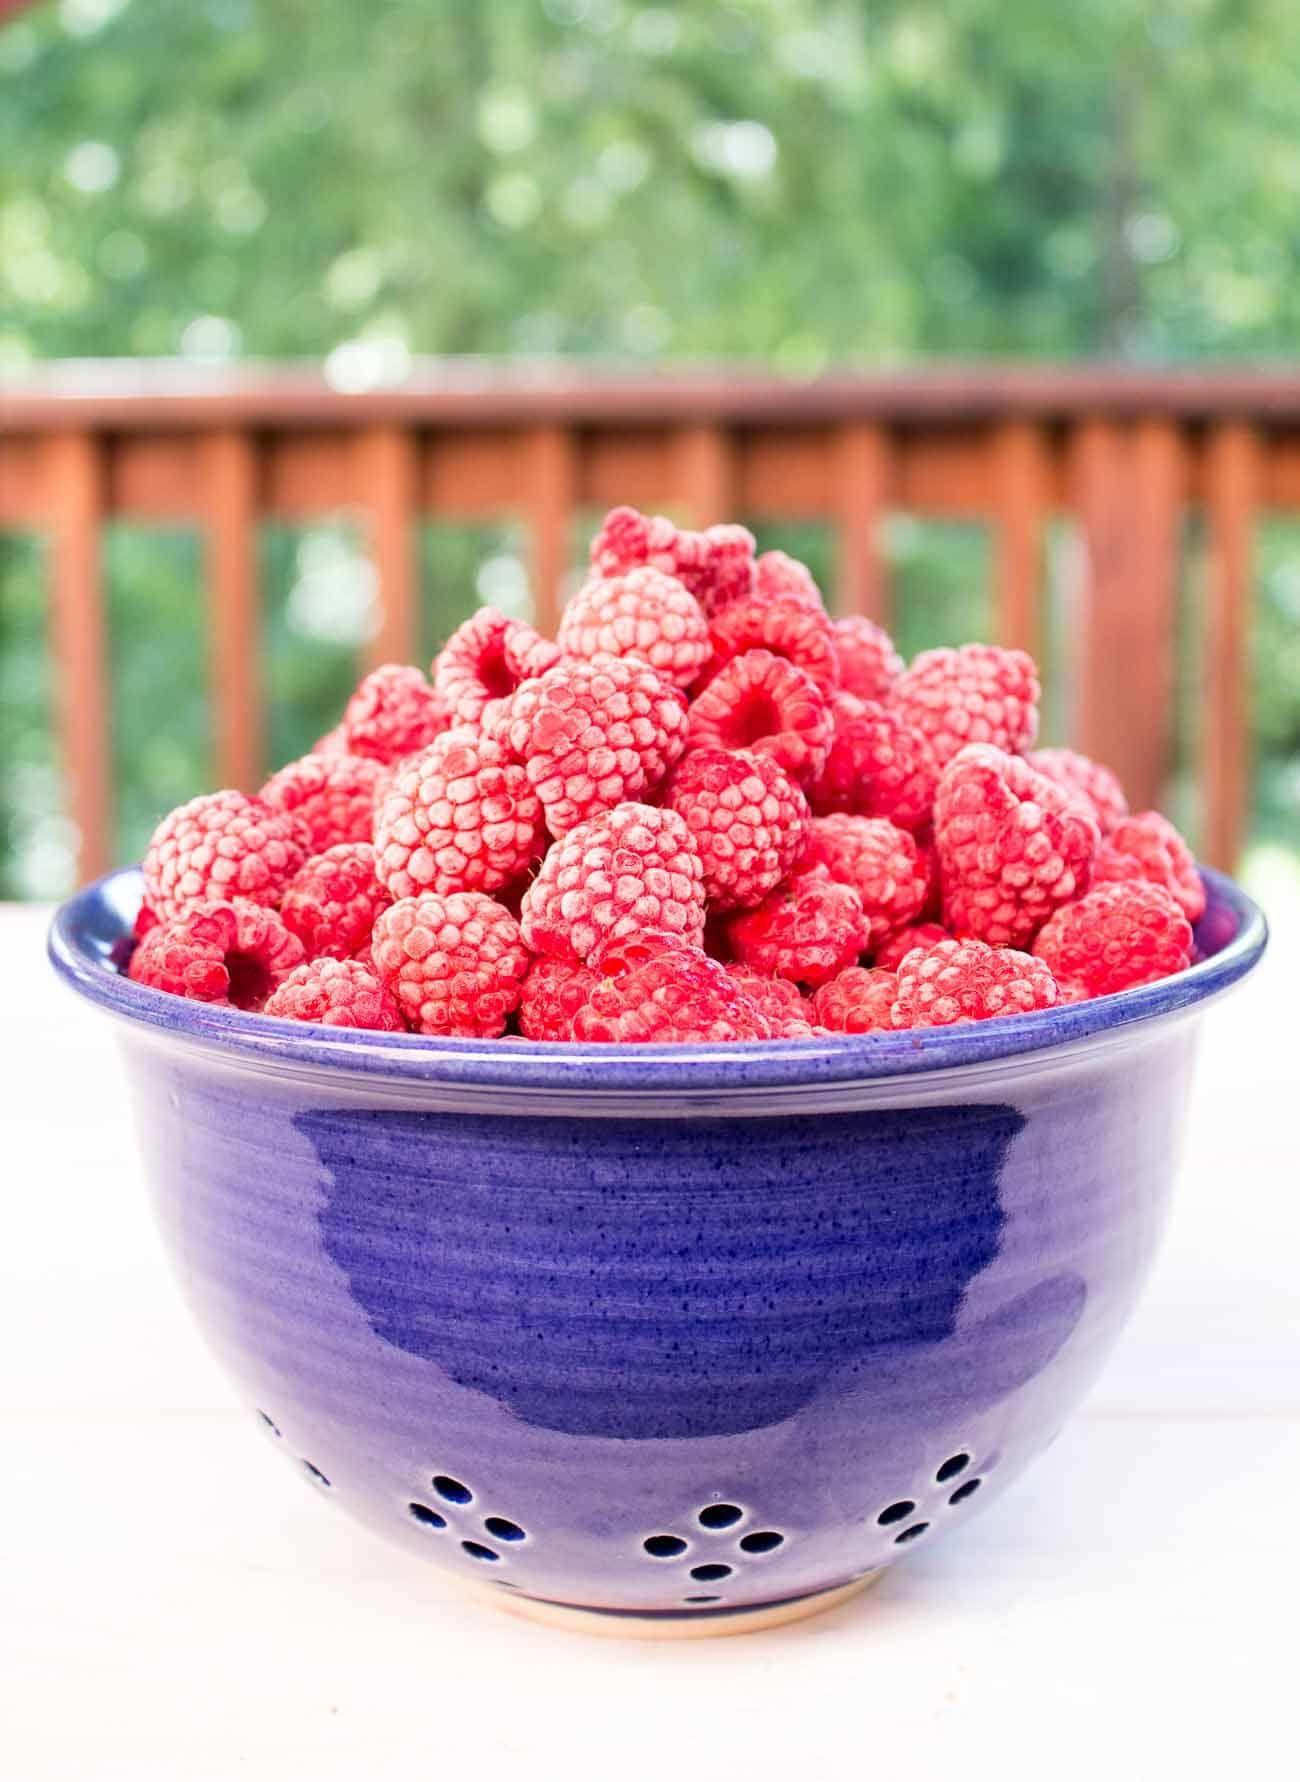 How to Prune Raspberries Raspberry, Frozen fresh, Freeze